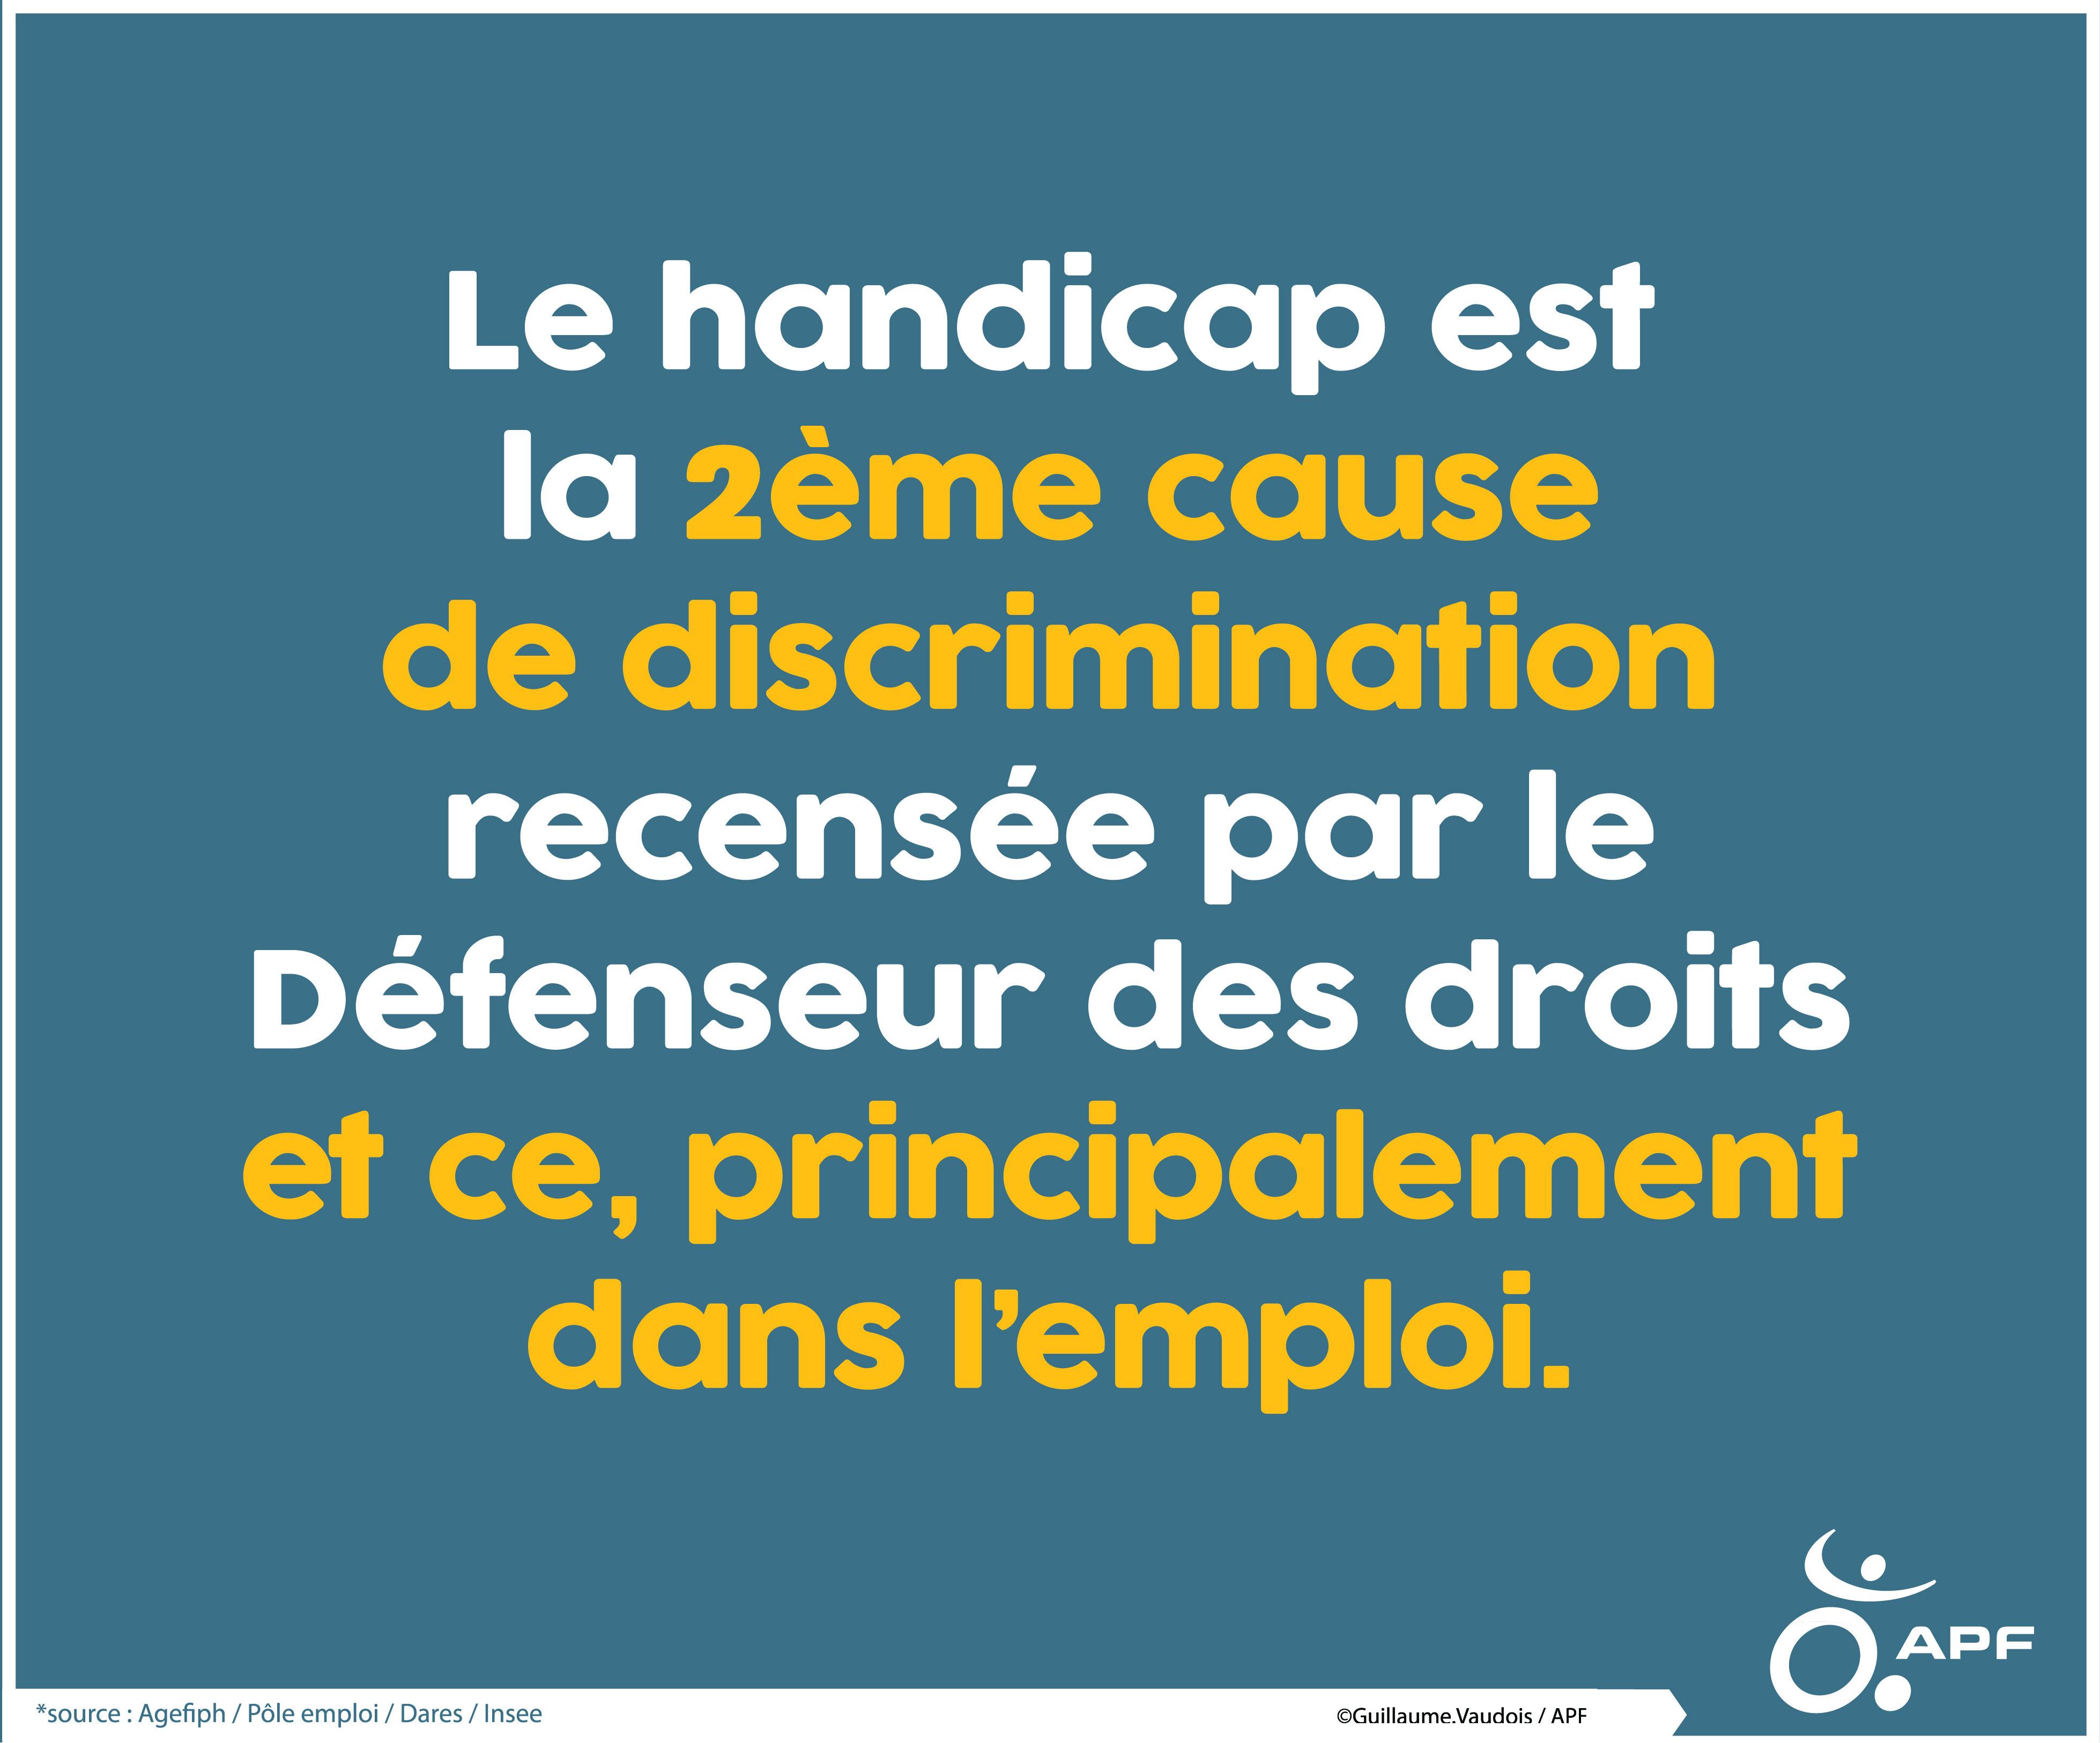 Handicap : discrimination dans l'emploi